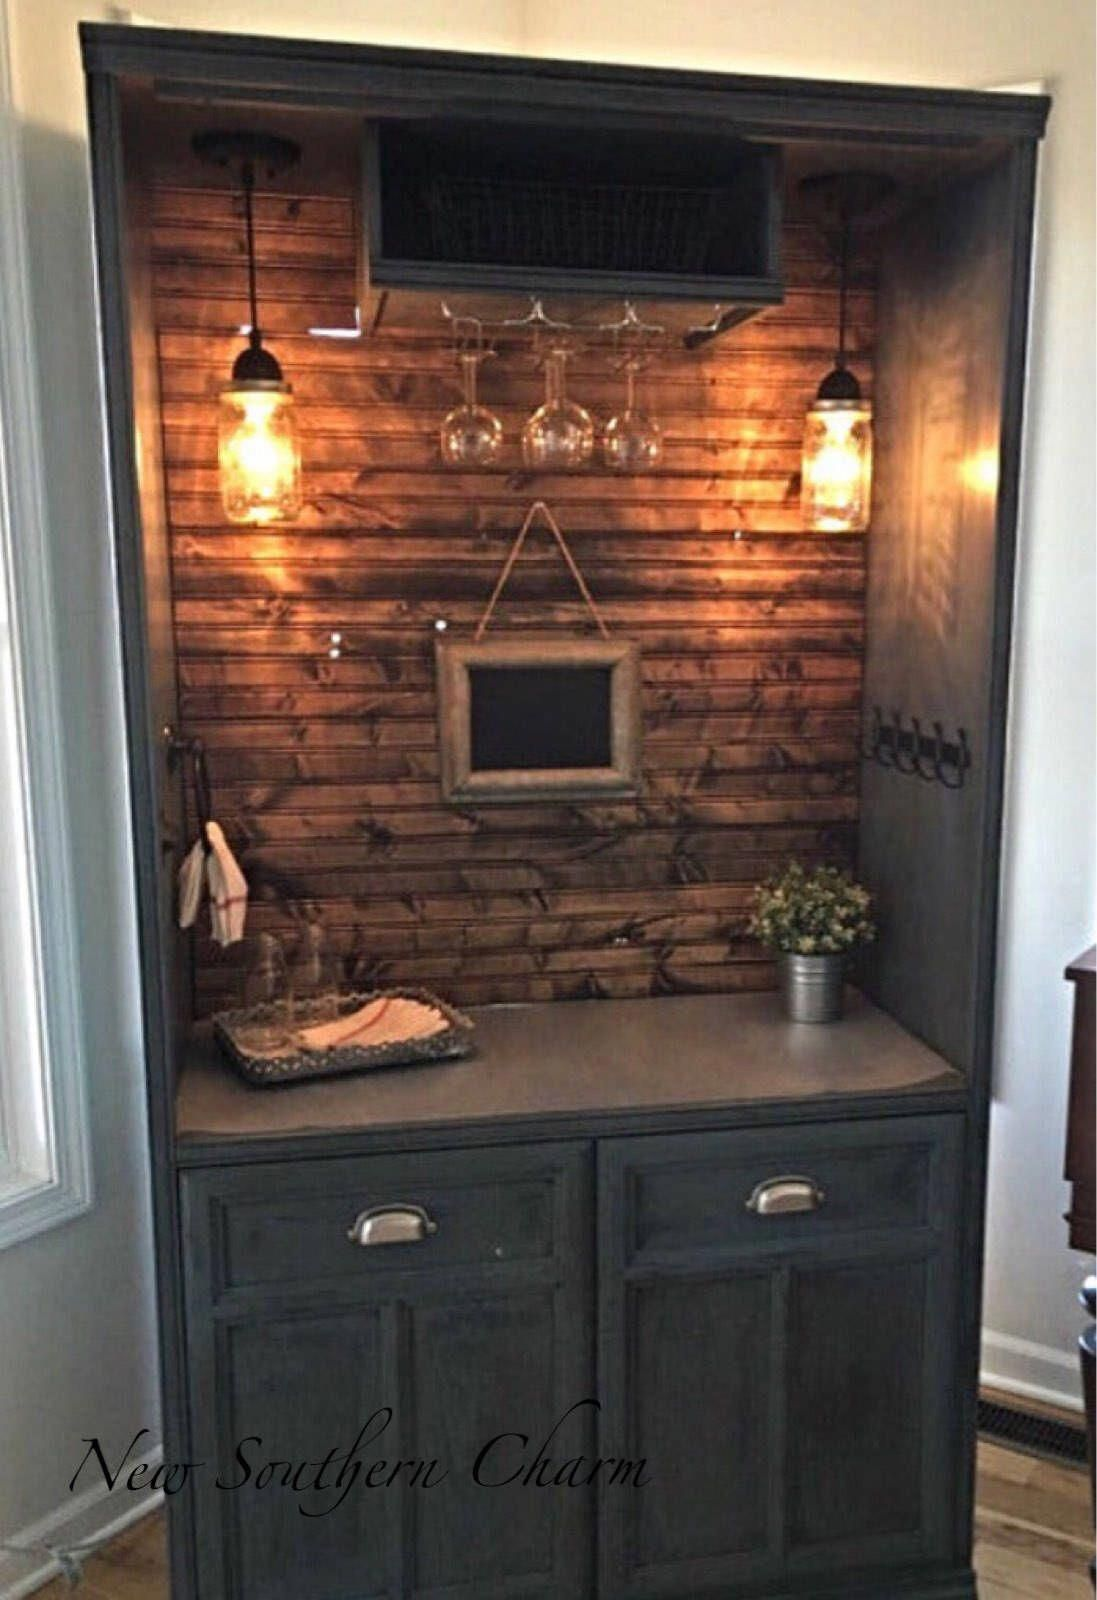 barfurnitureideas cabinet dimensions affirmation handsome cool bars armoires